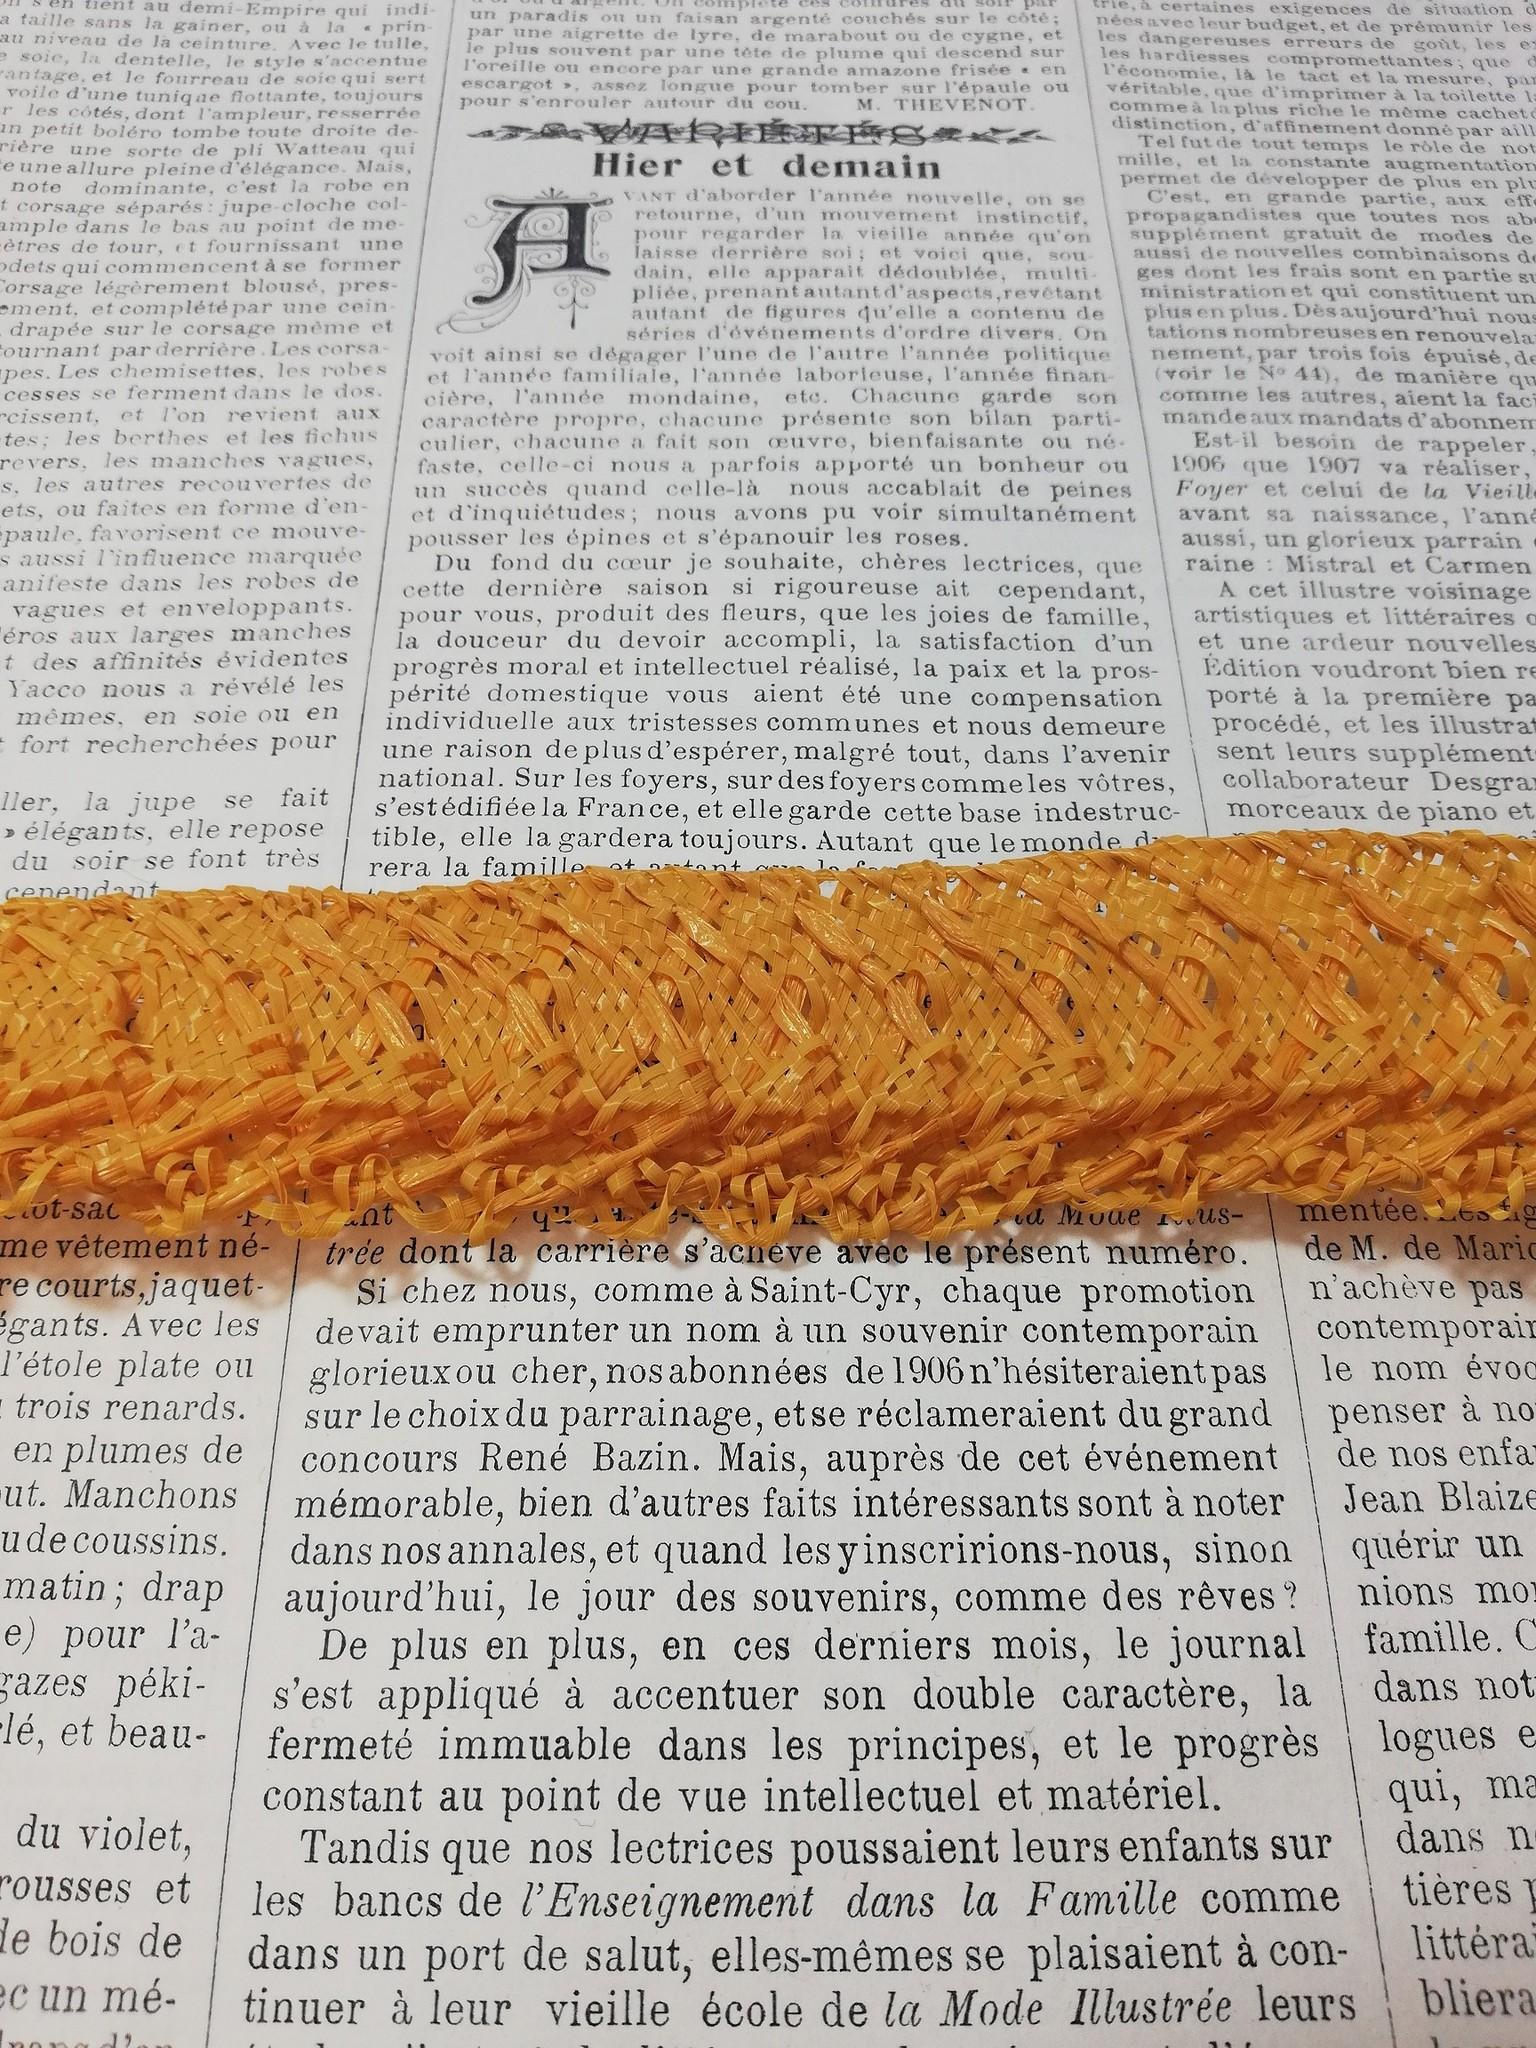 Vintage hat straw braid diff. colors